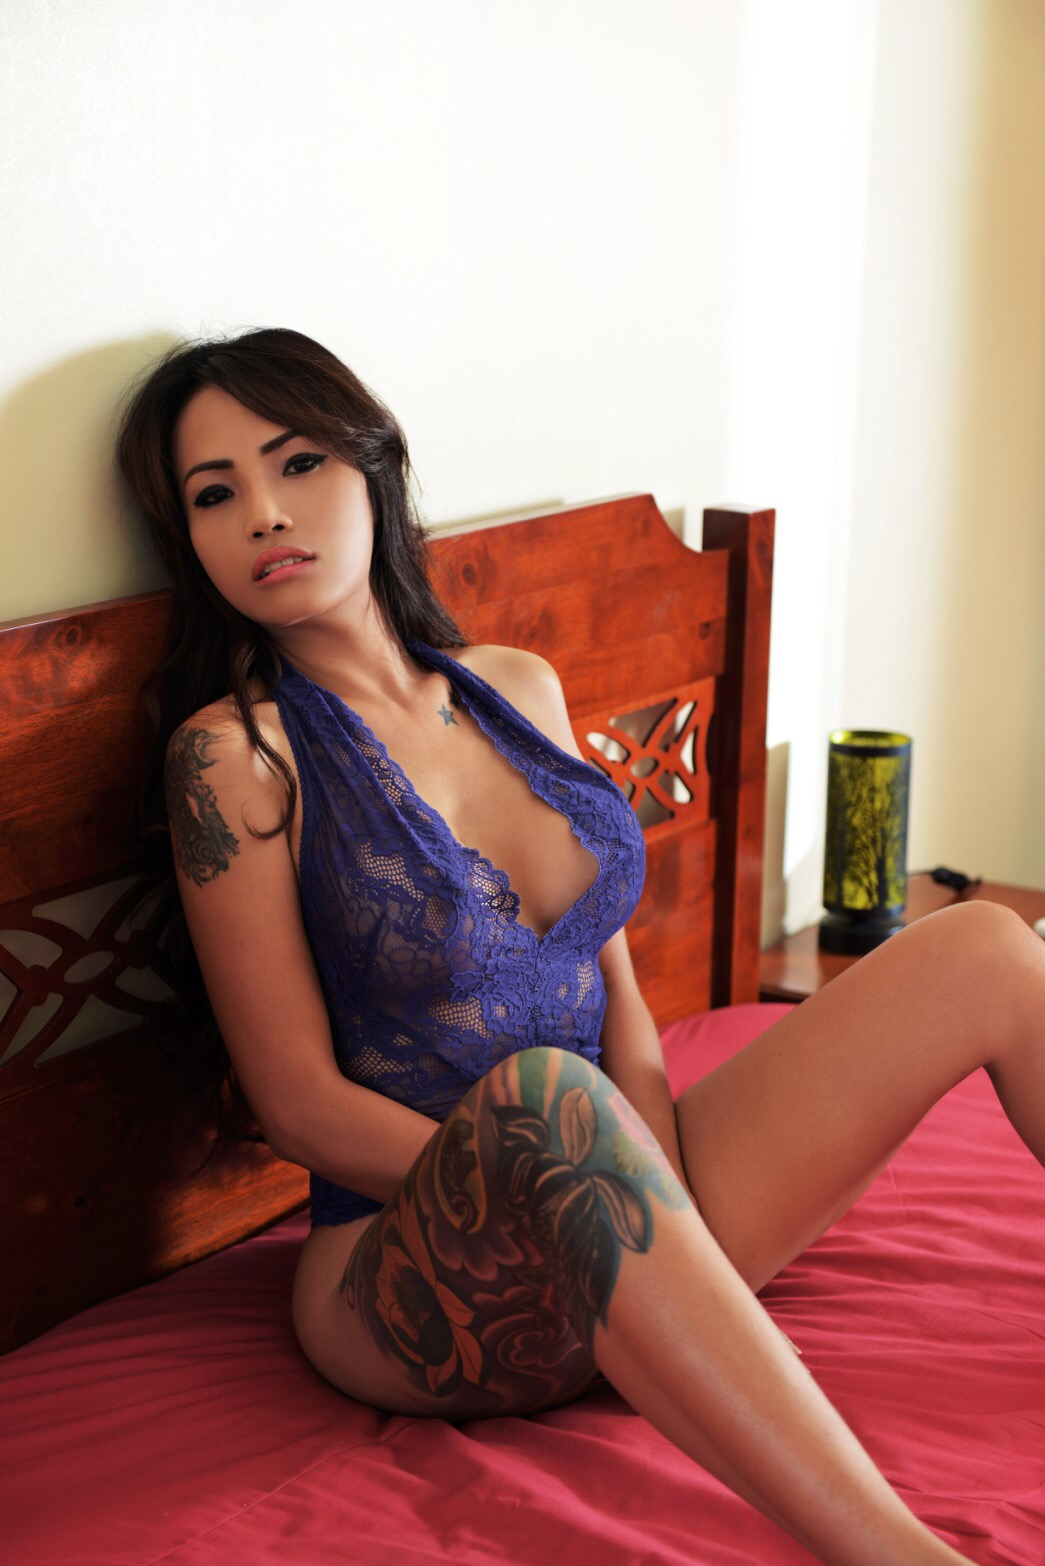 lång massage parlor sex